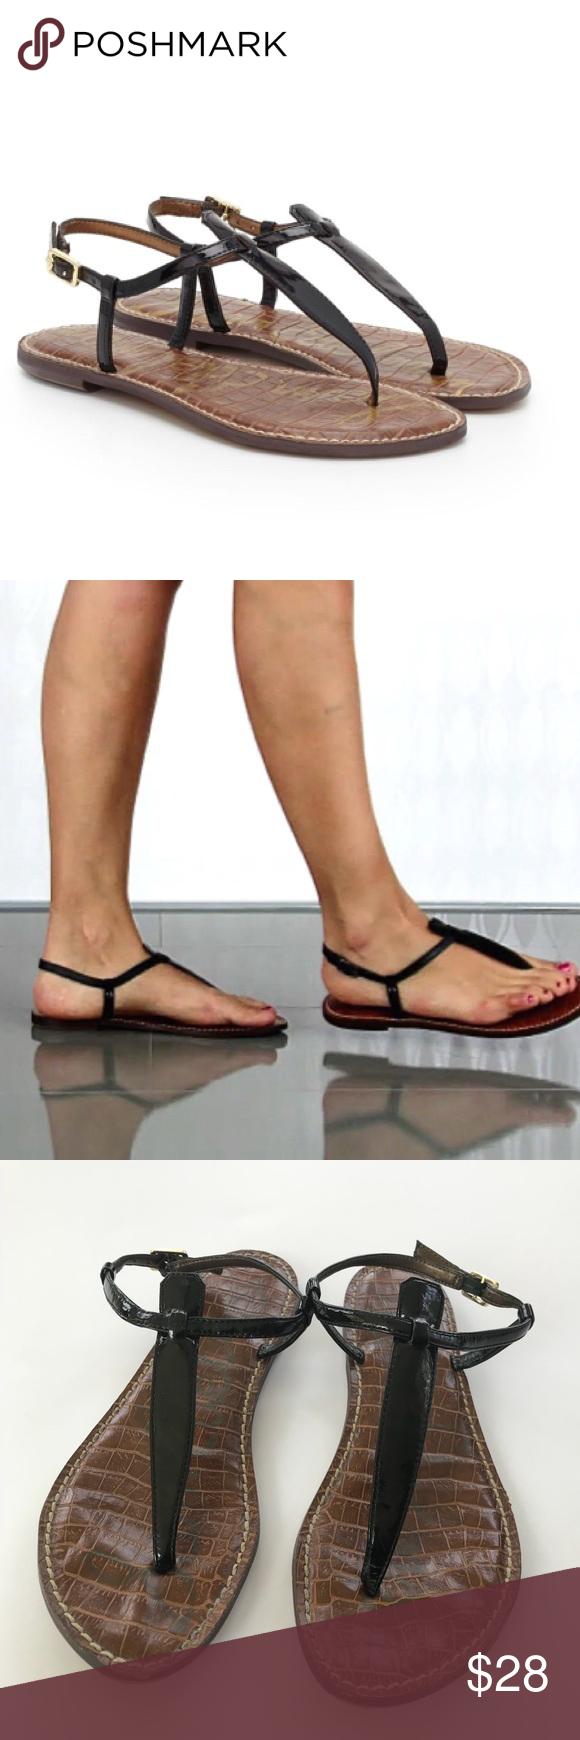 5388fd150dff Sam Edelman Gigi Black Patent Thong Sandals Sz 8 The iconic Gigi Thong  Sandal is a